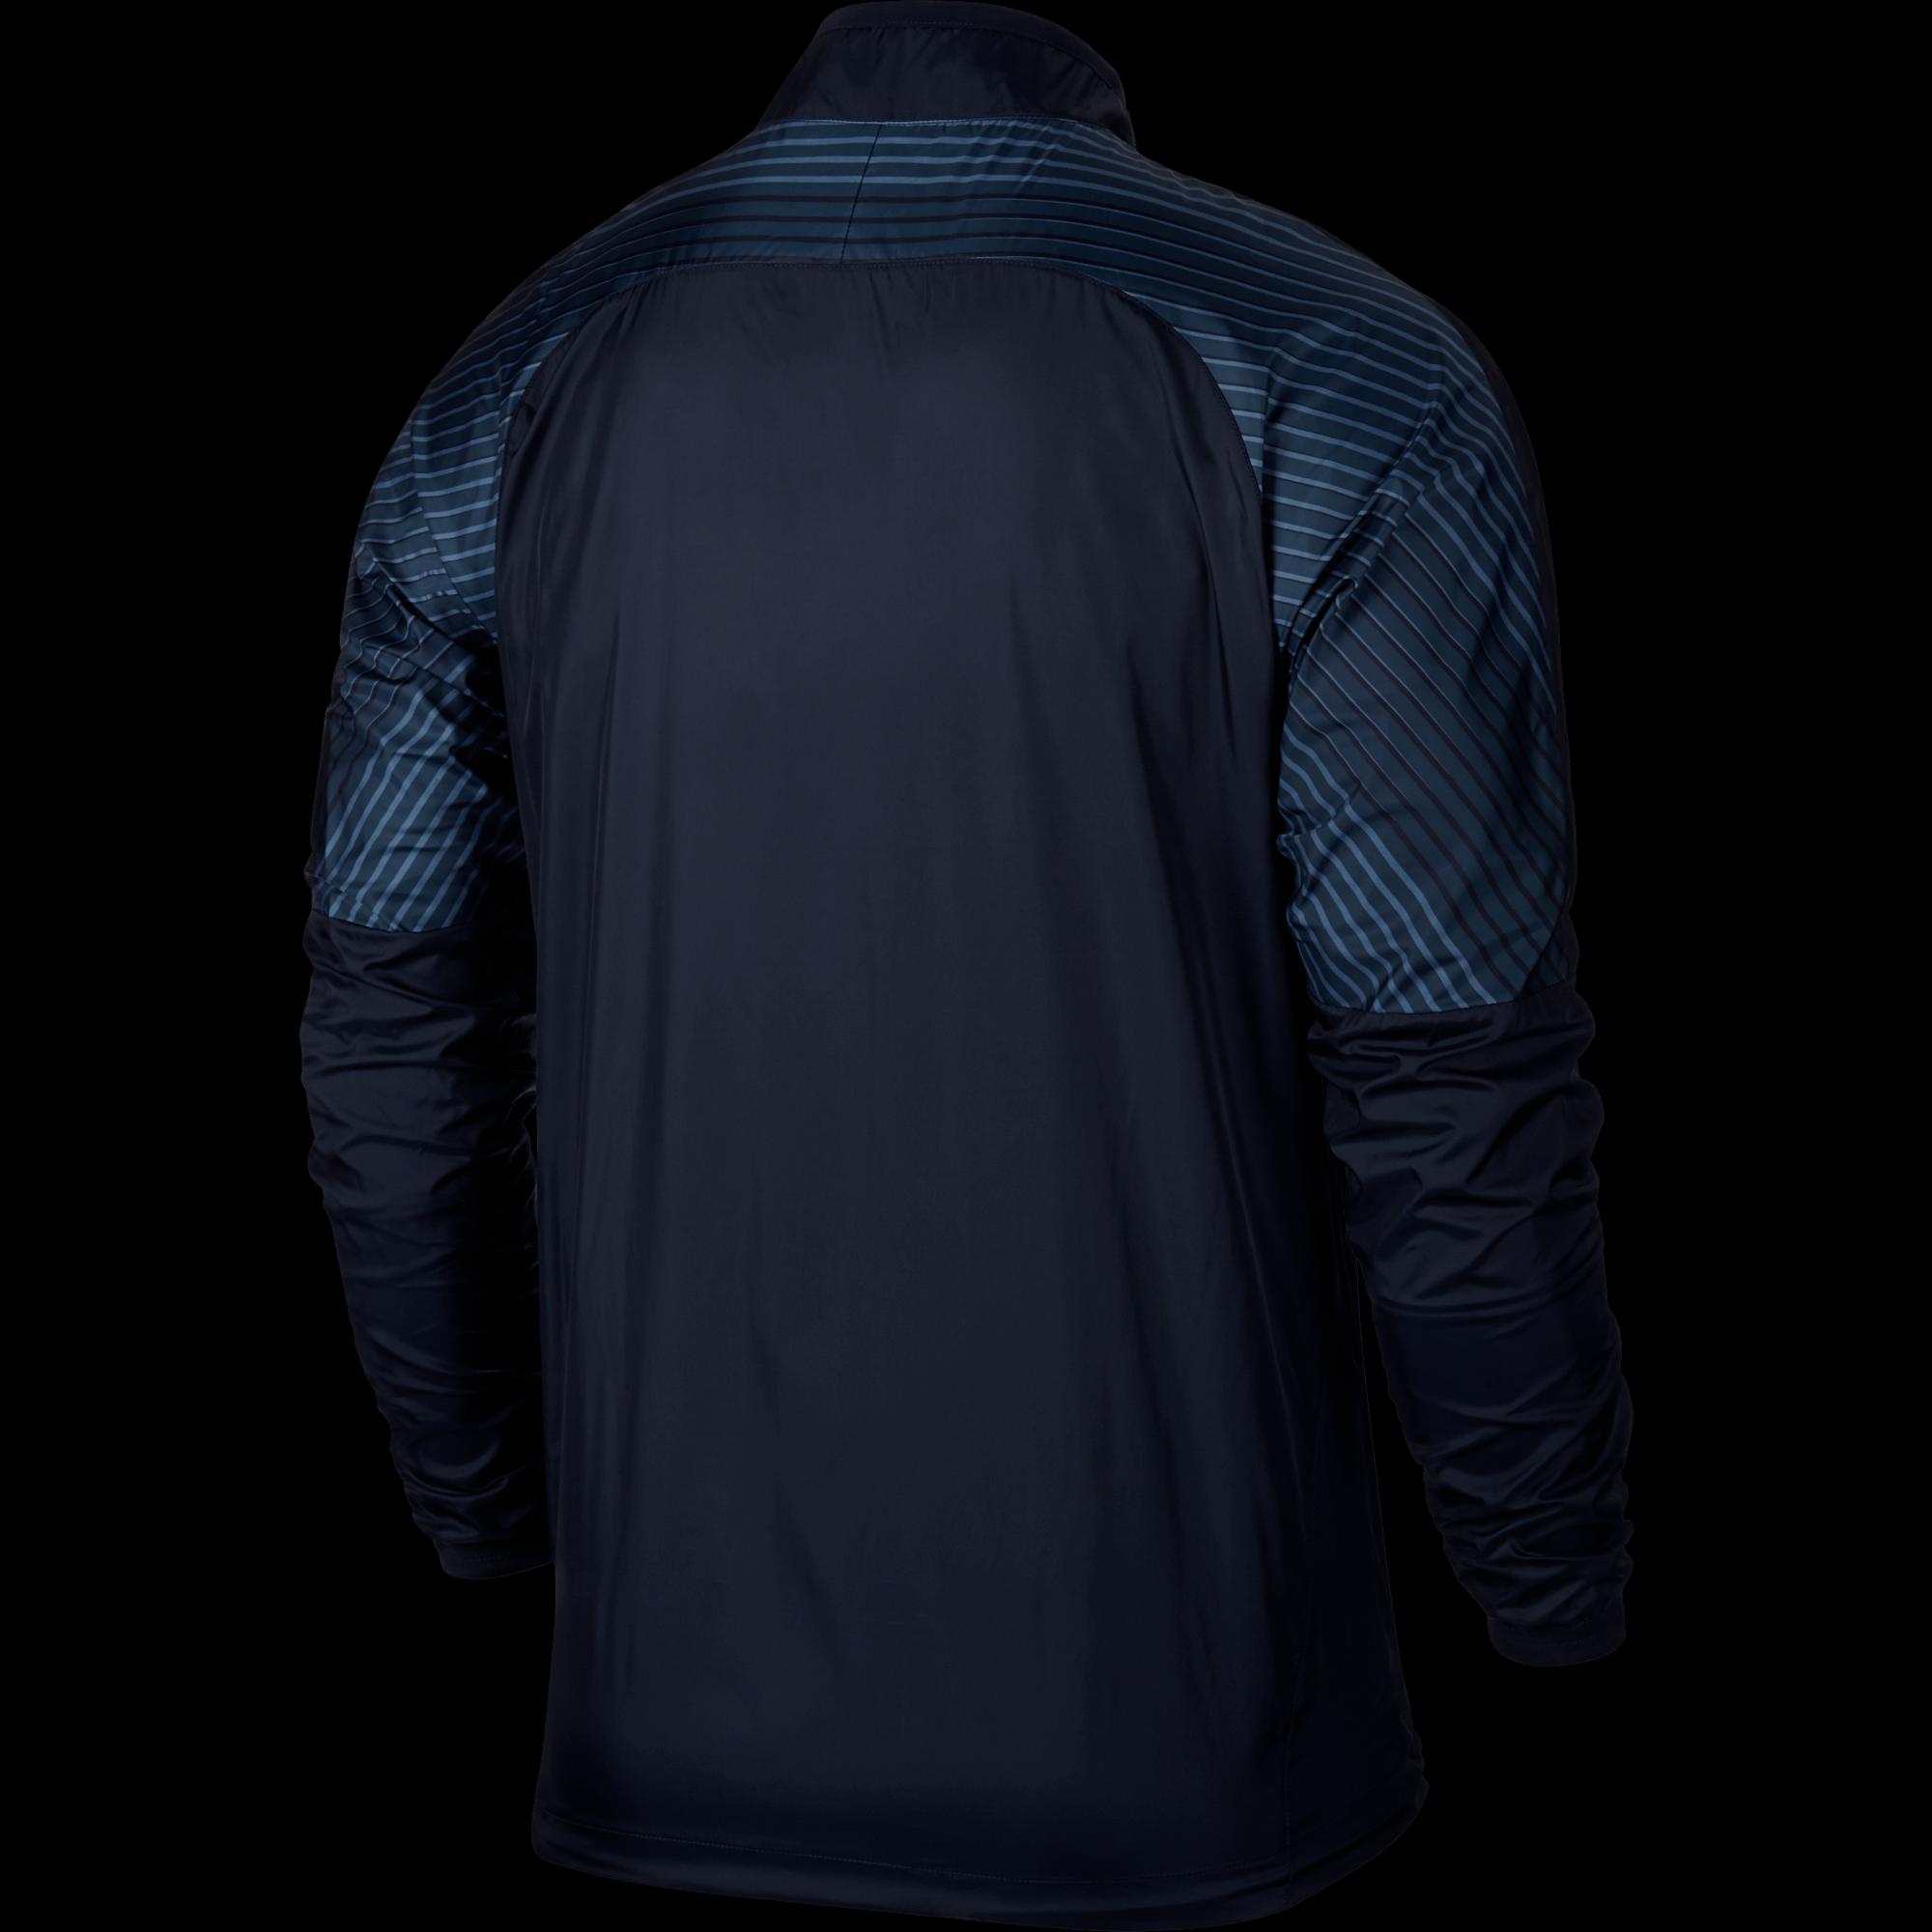 Nike Revolution Graphic Woven Jacket – Donkerblauw achterkant jacket